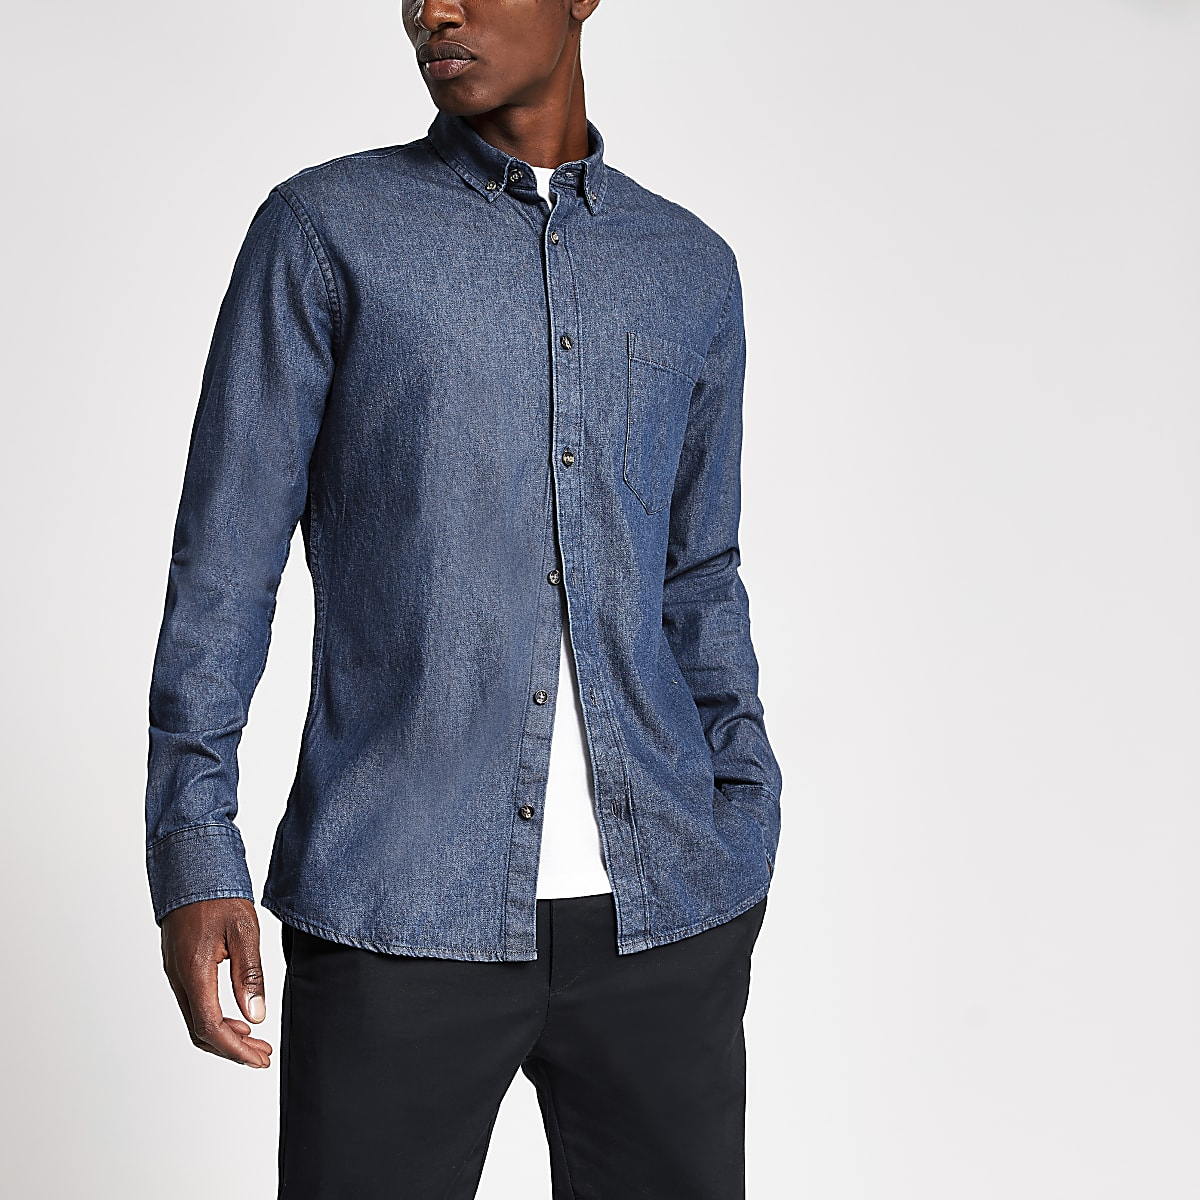 Only & Sons - Donkerblauw slim-fit denim overhemd